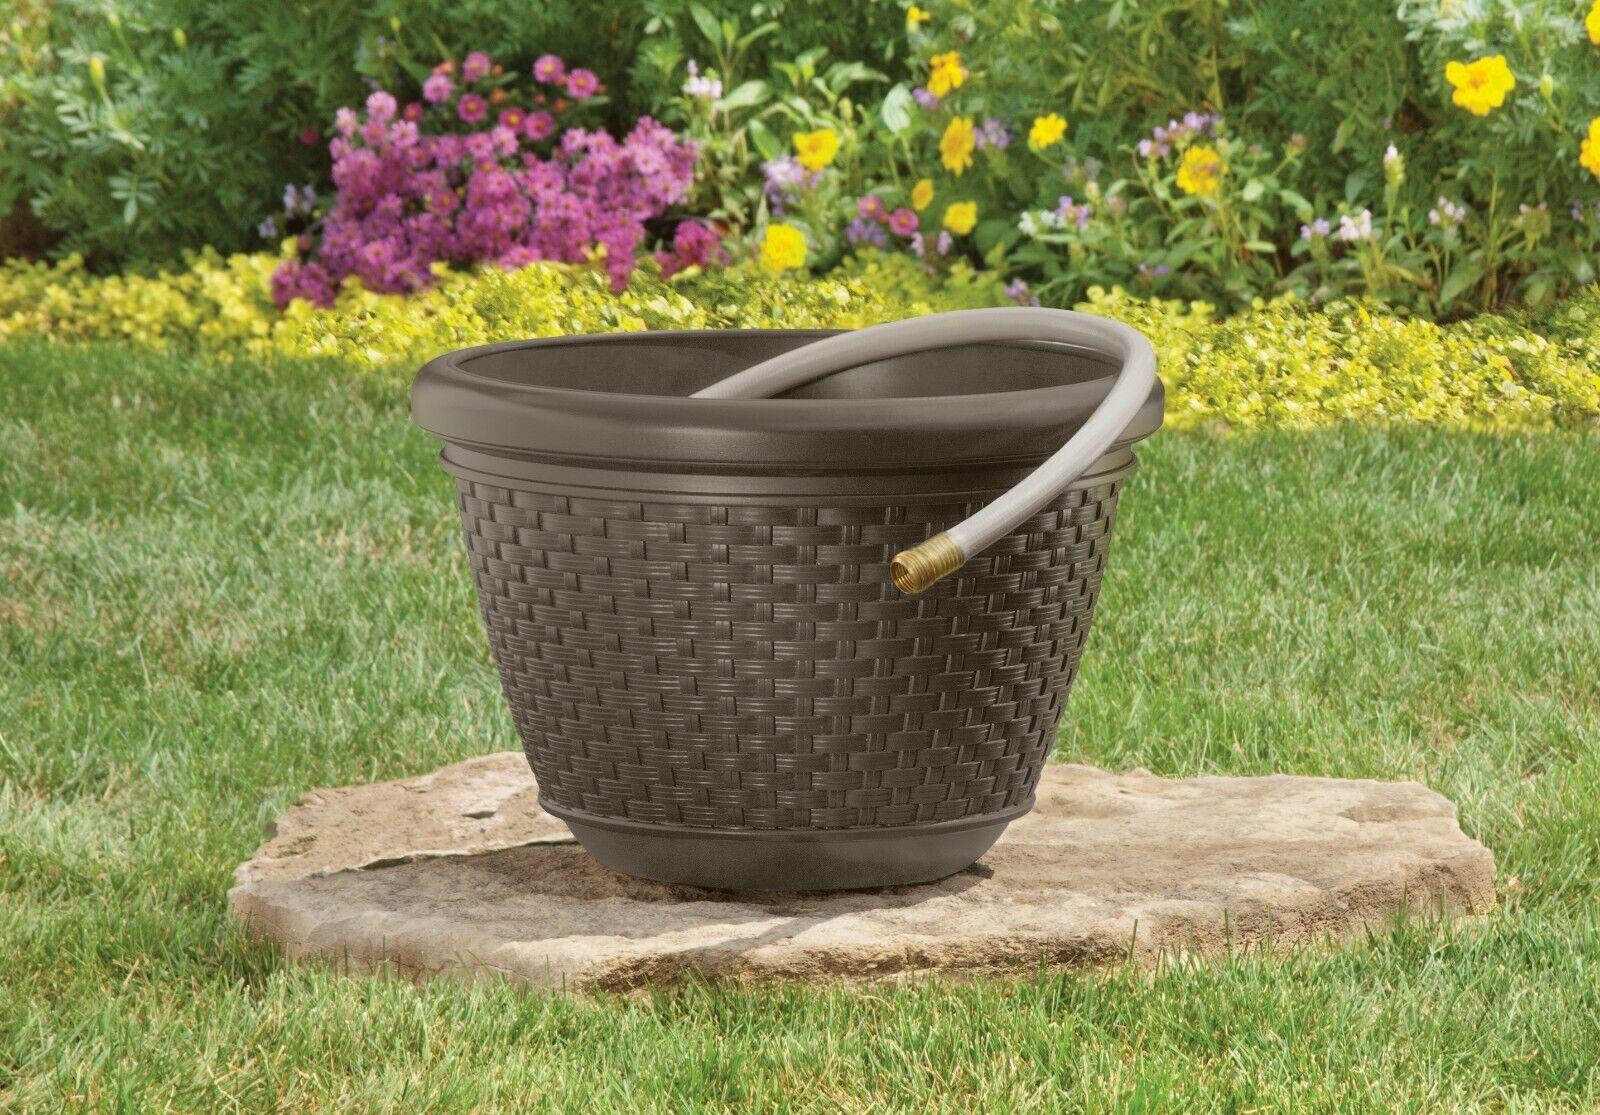 100 ft. Resin Wicker Hose Decorative Planter Pot, Java Brown